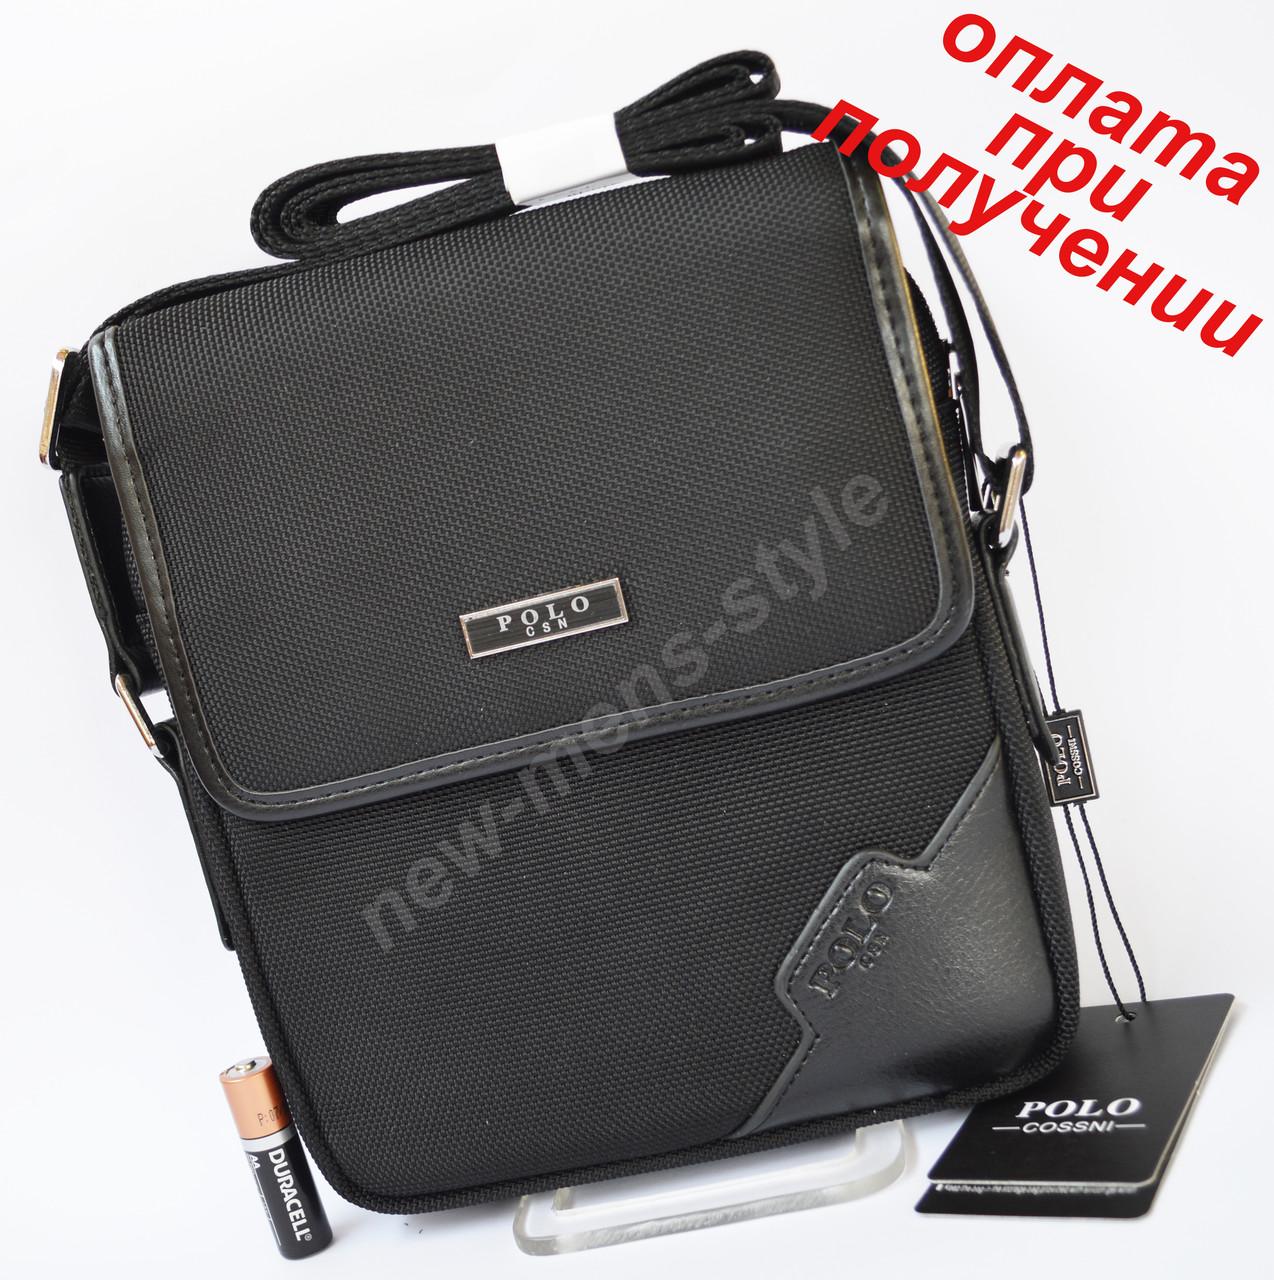 329f621bb9b0 Мужская тканевая спортивная сумка рюкзак бананка слинг на плечо POLO ...